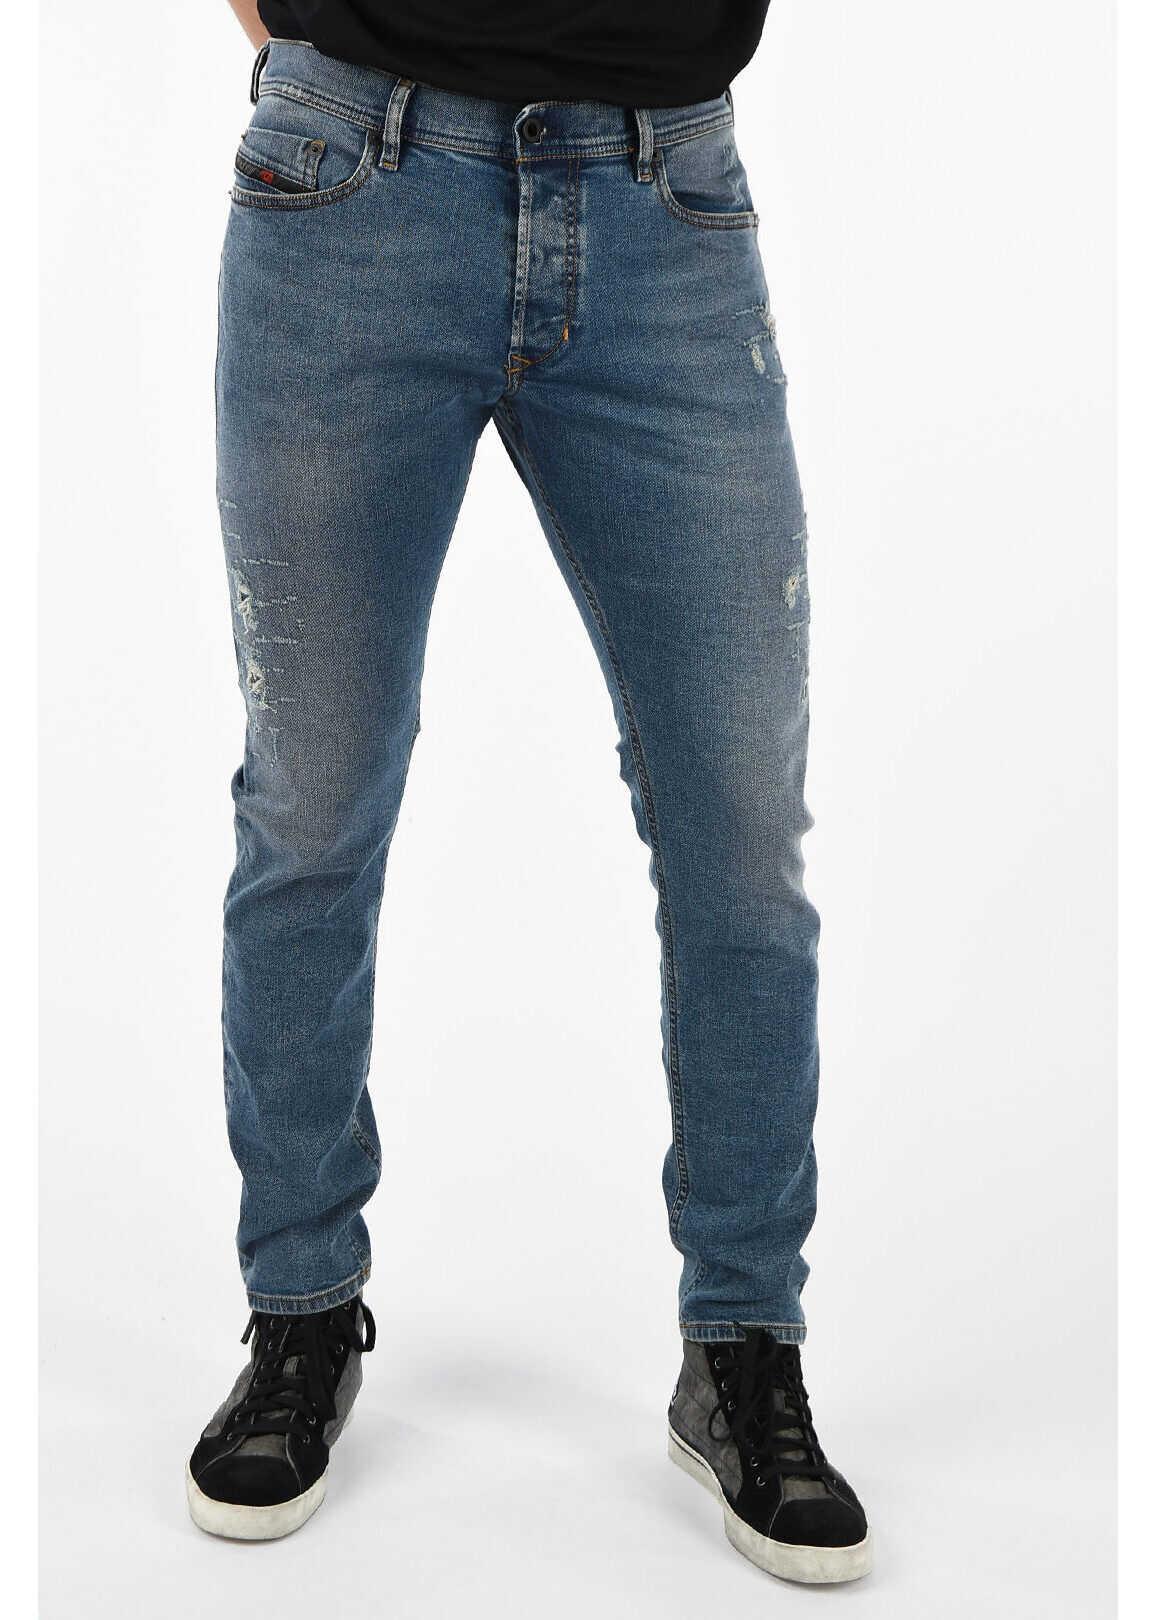 Diesel 17cm Distressed TEPPHAR L.32 Jeans BLUE